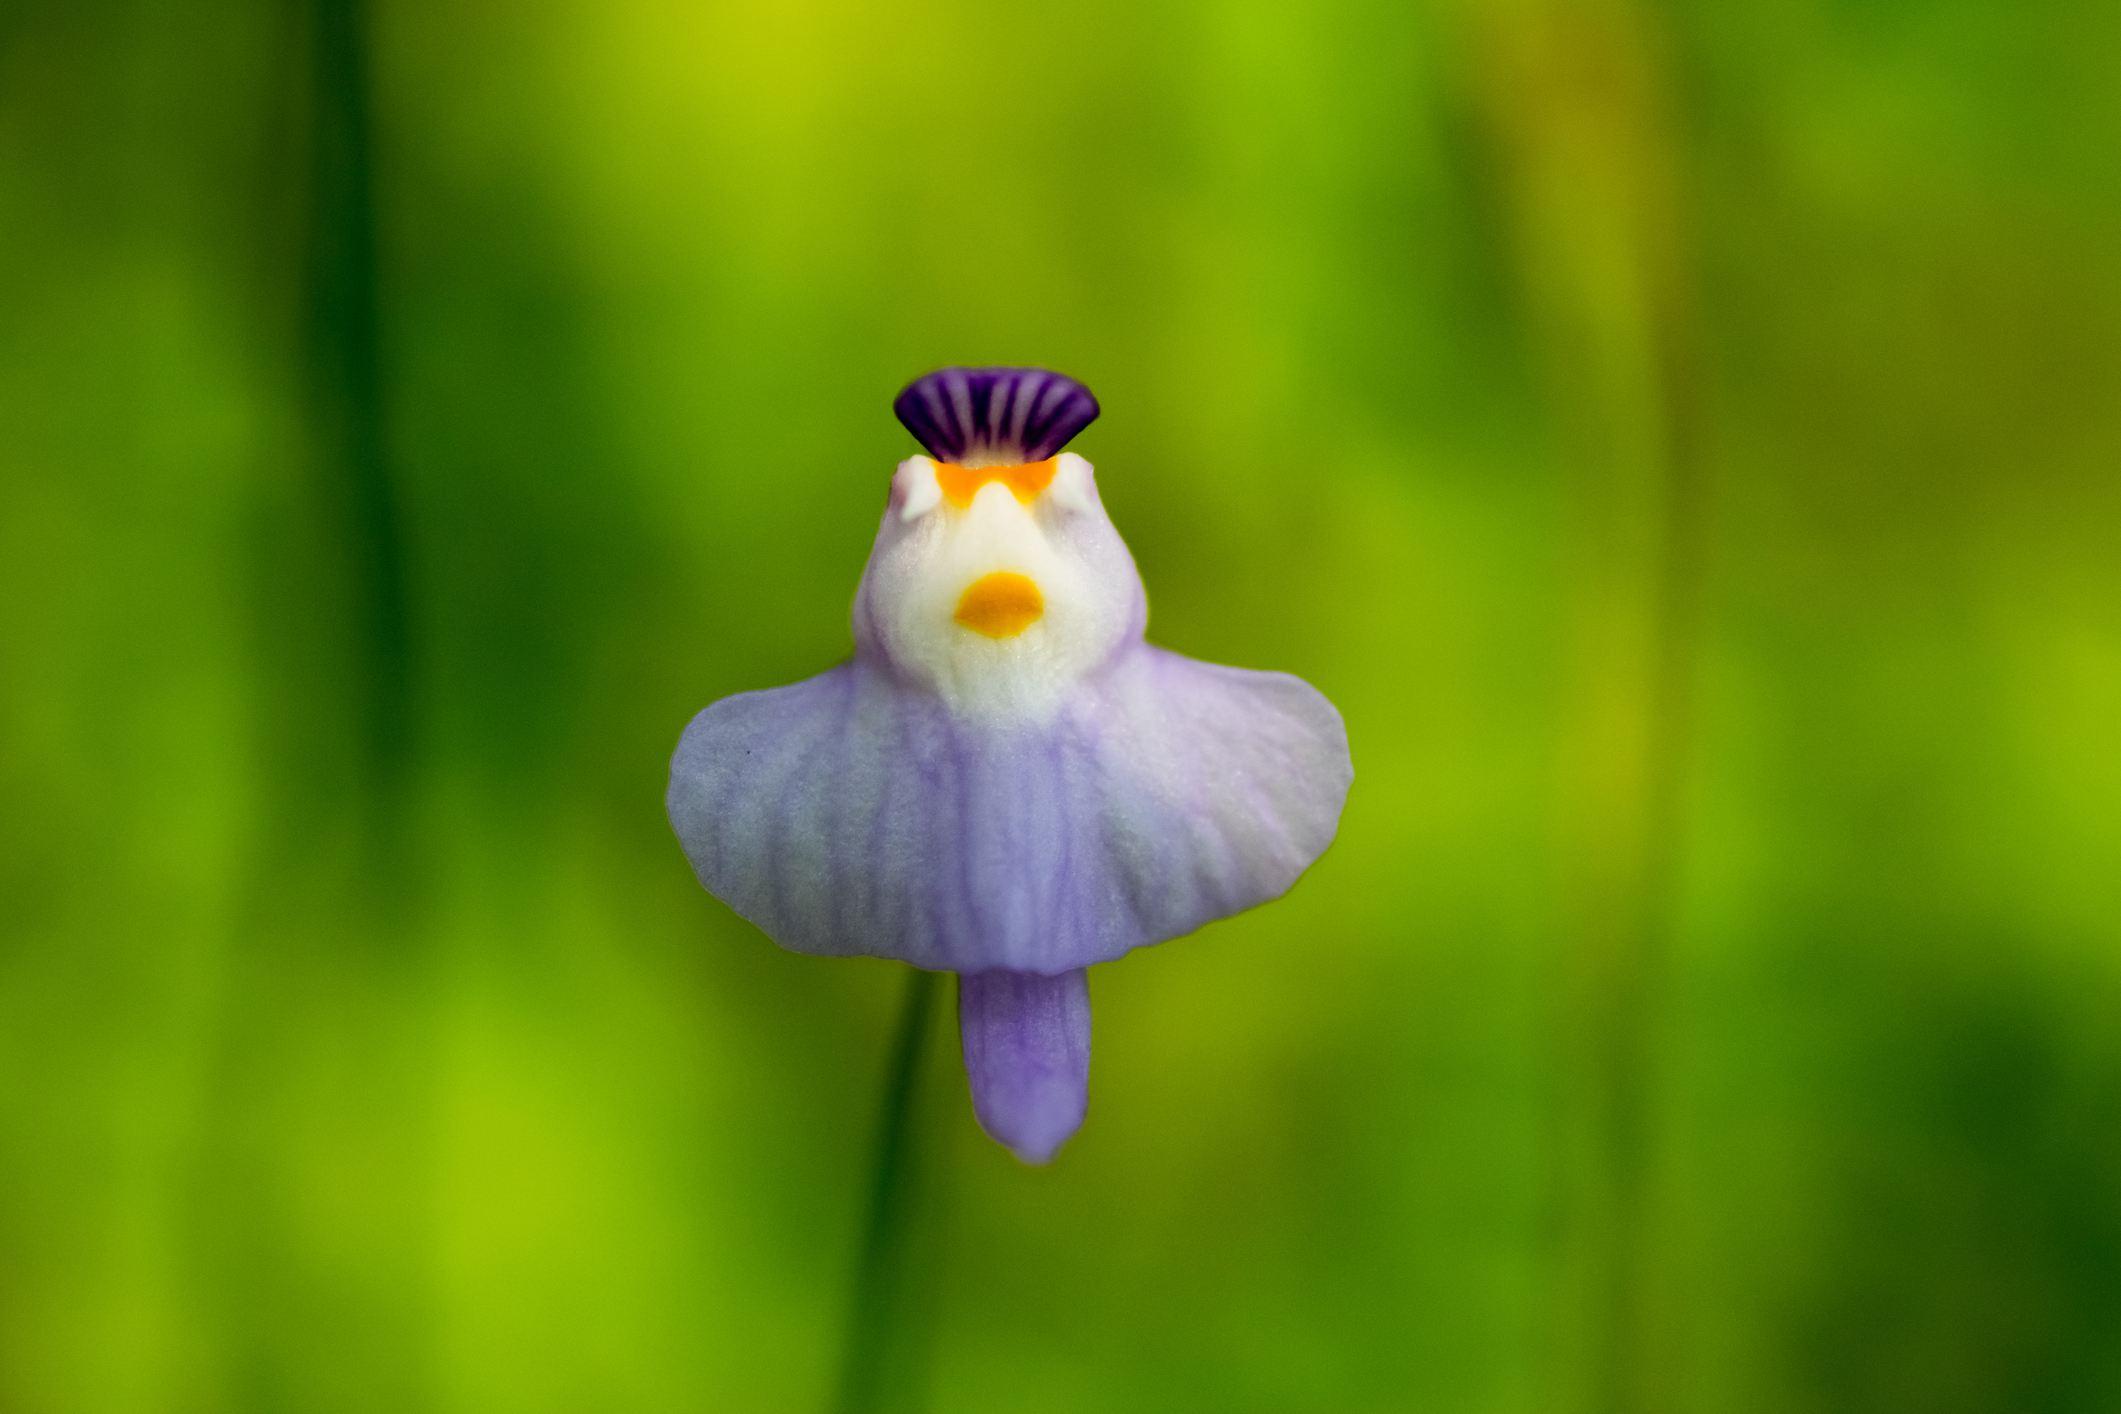 Carnivorous bladderwort plant with lavender flower.